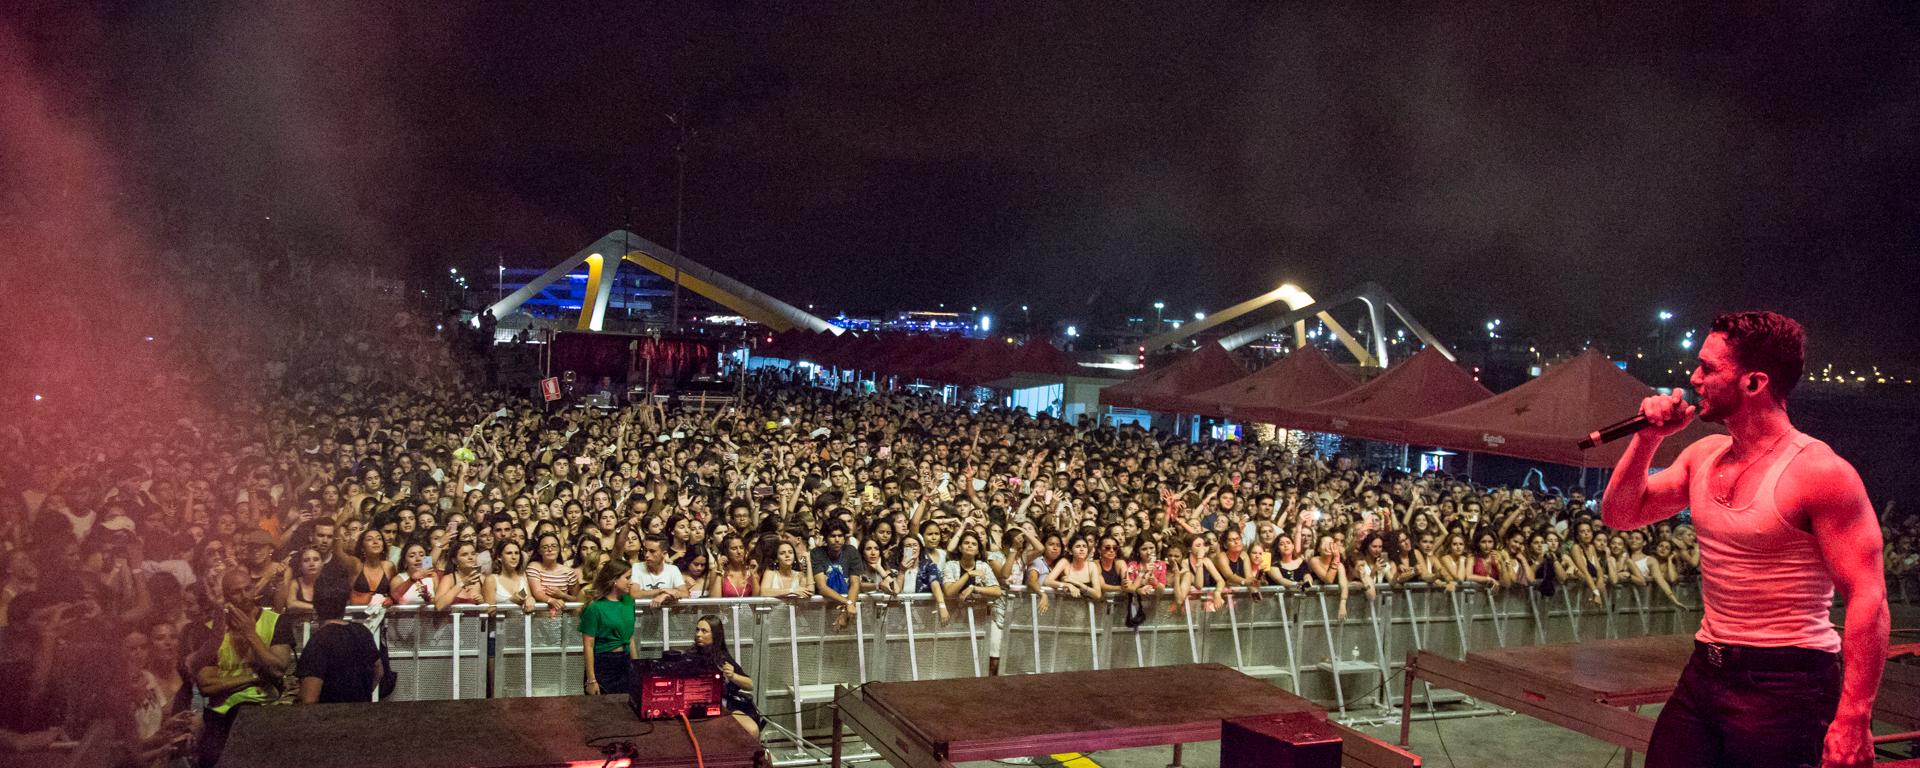 Valencia Music Experience 2018